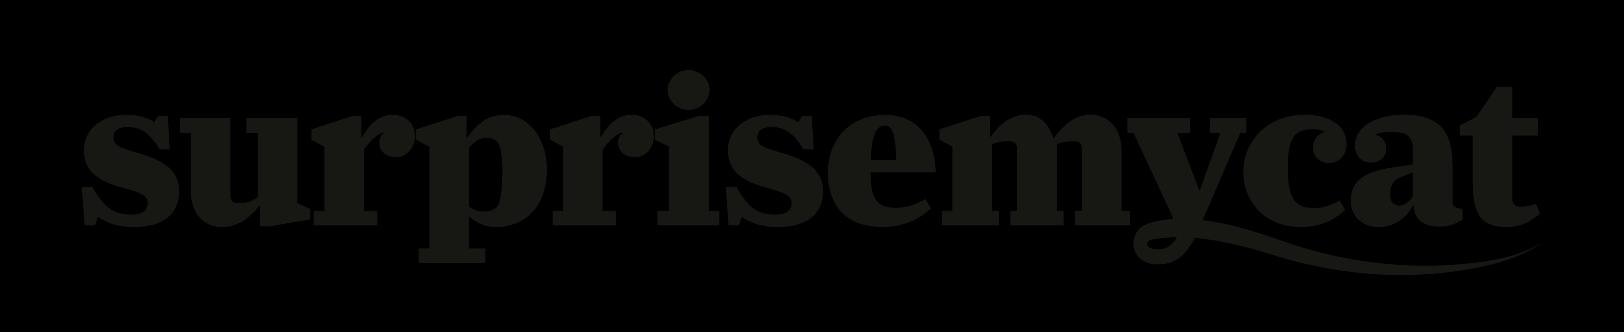 surprise-my-cat-logo